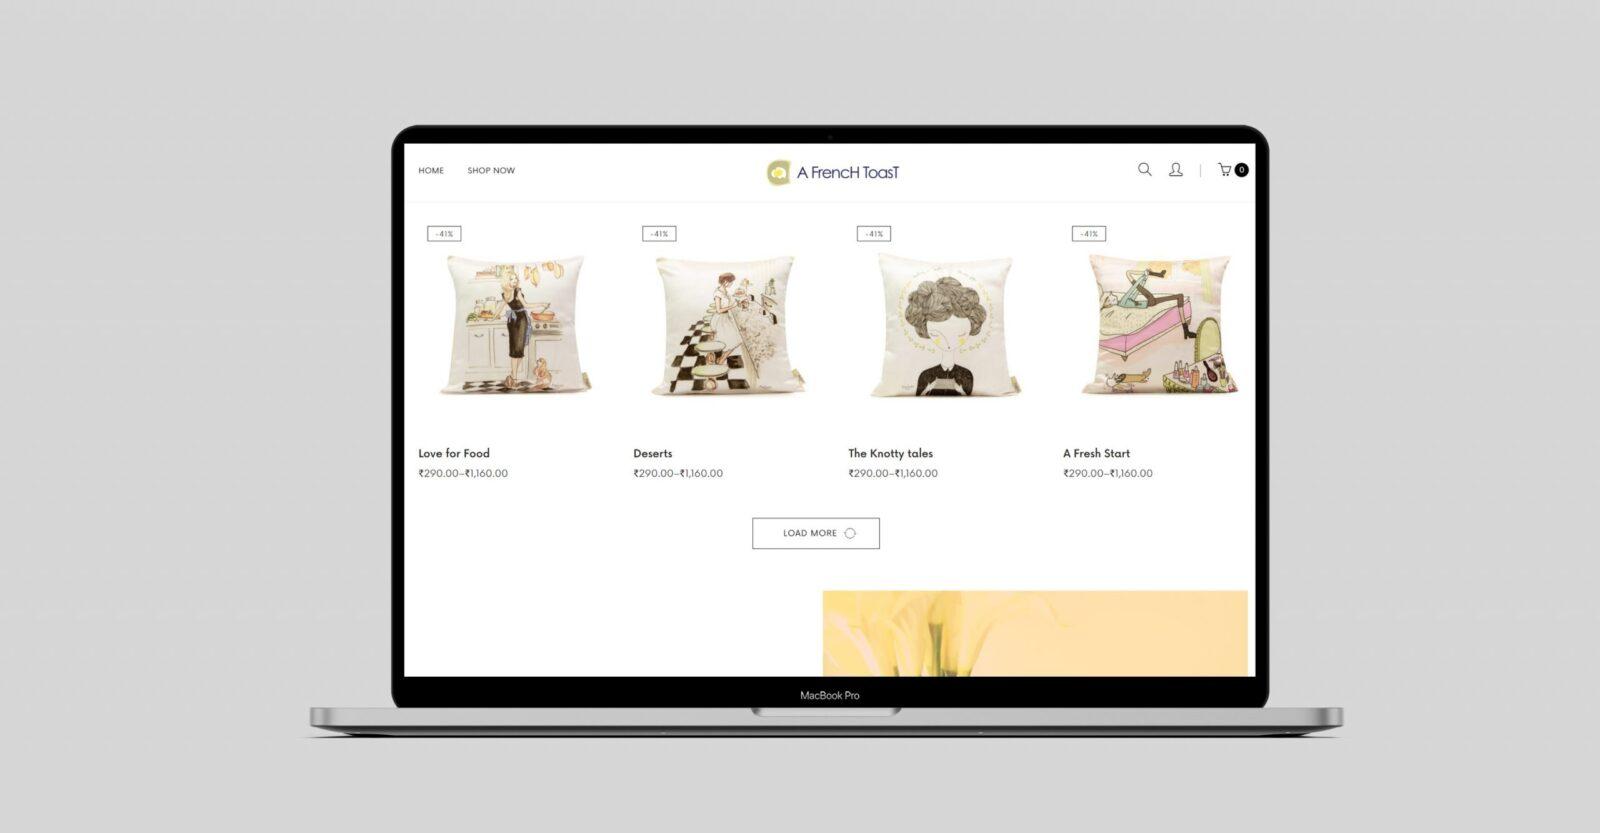 ecommerce site development, ecommerce web design agency